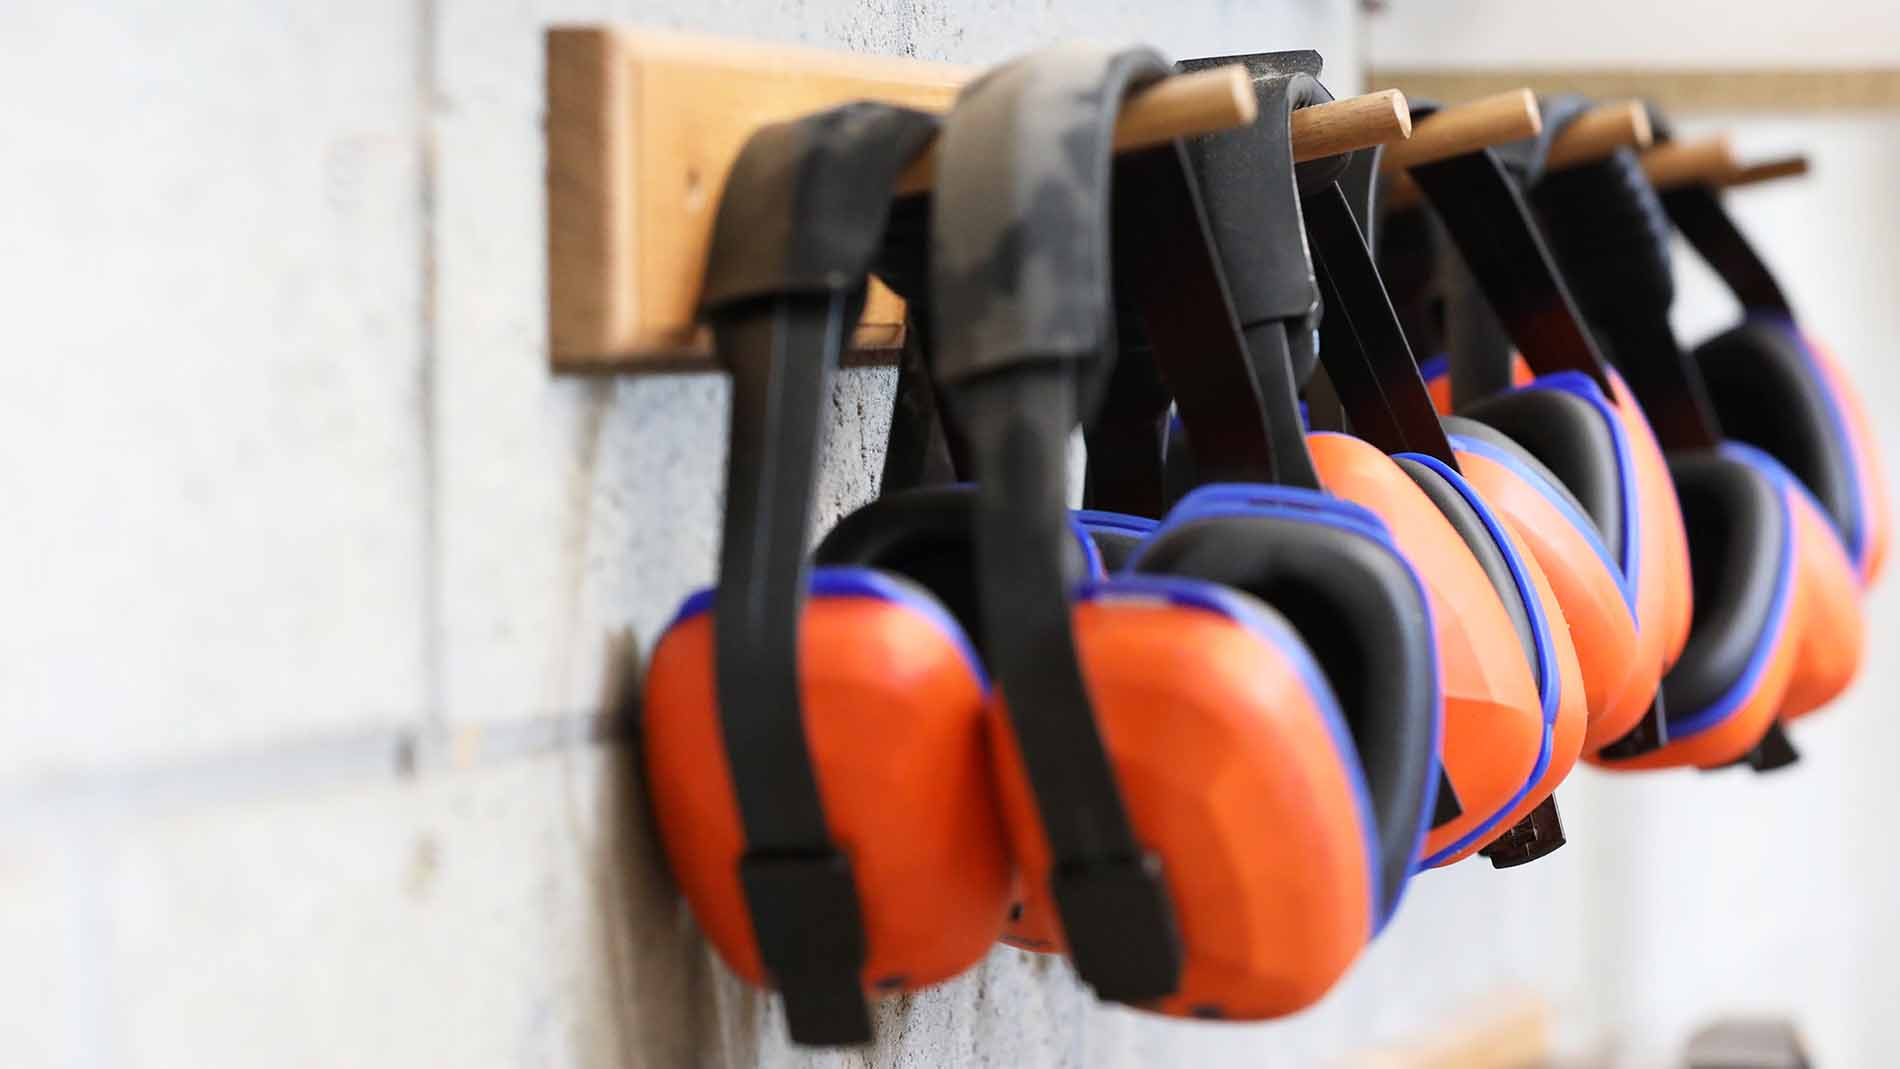 Row of ear protection head phones